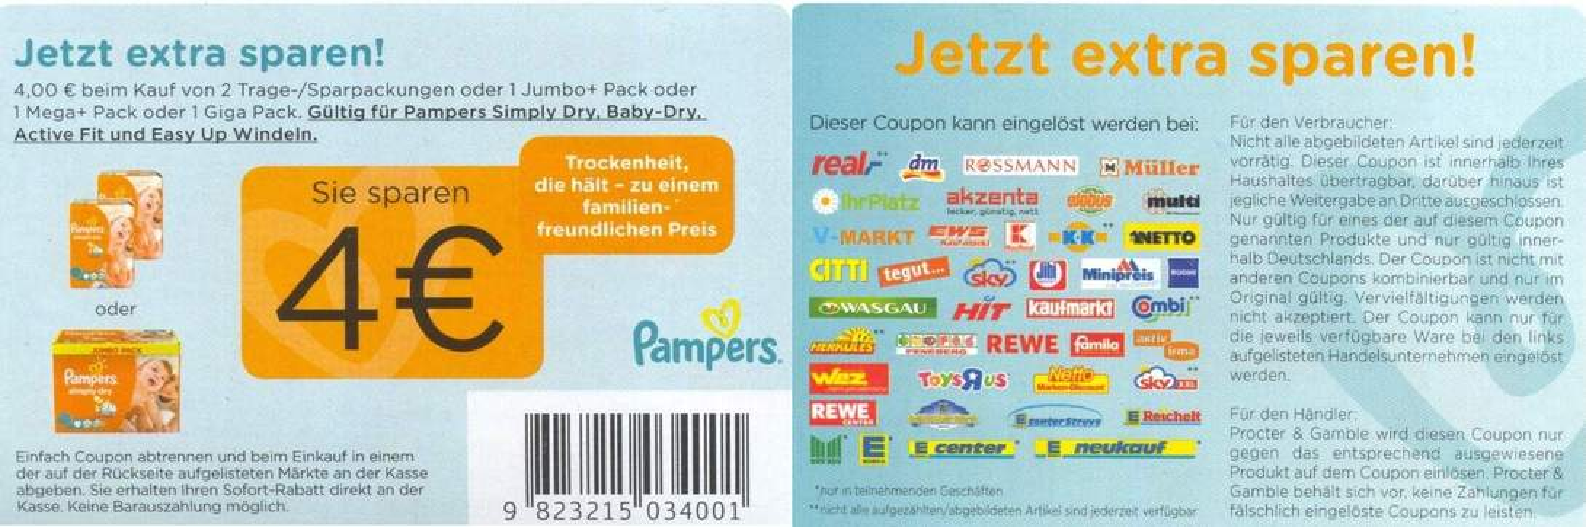 bundesweit alle supermarkt deals kw33 14 angebote coupons achtung hohes datenvolumen. Black Bedroom Furniture Sets. Home Design Ideas